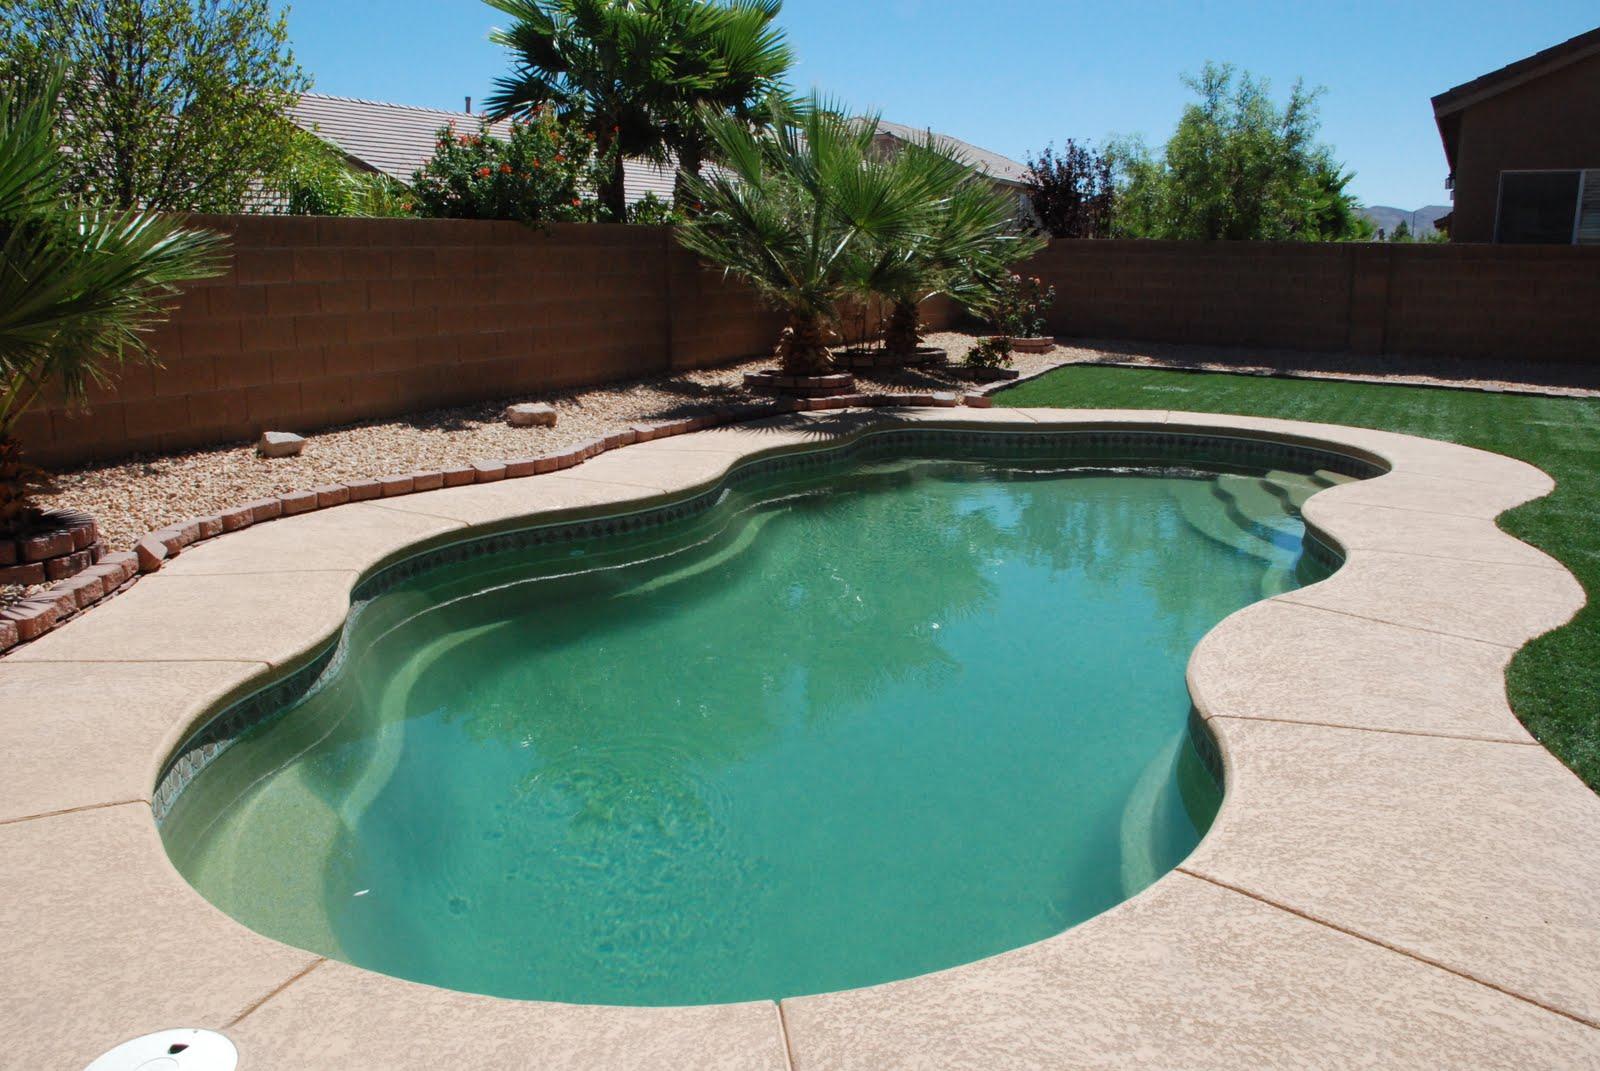 Swimming pools and spas by Mall Fiberglass Pool - (800x600 - 156kB)